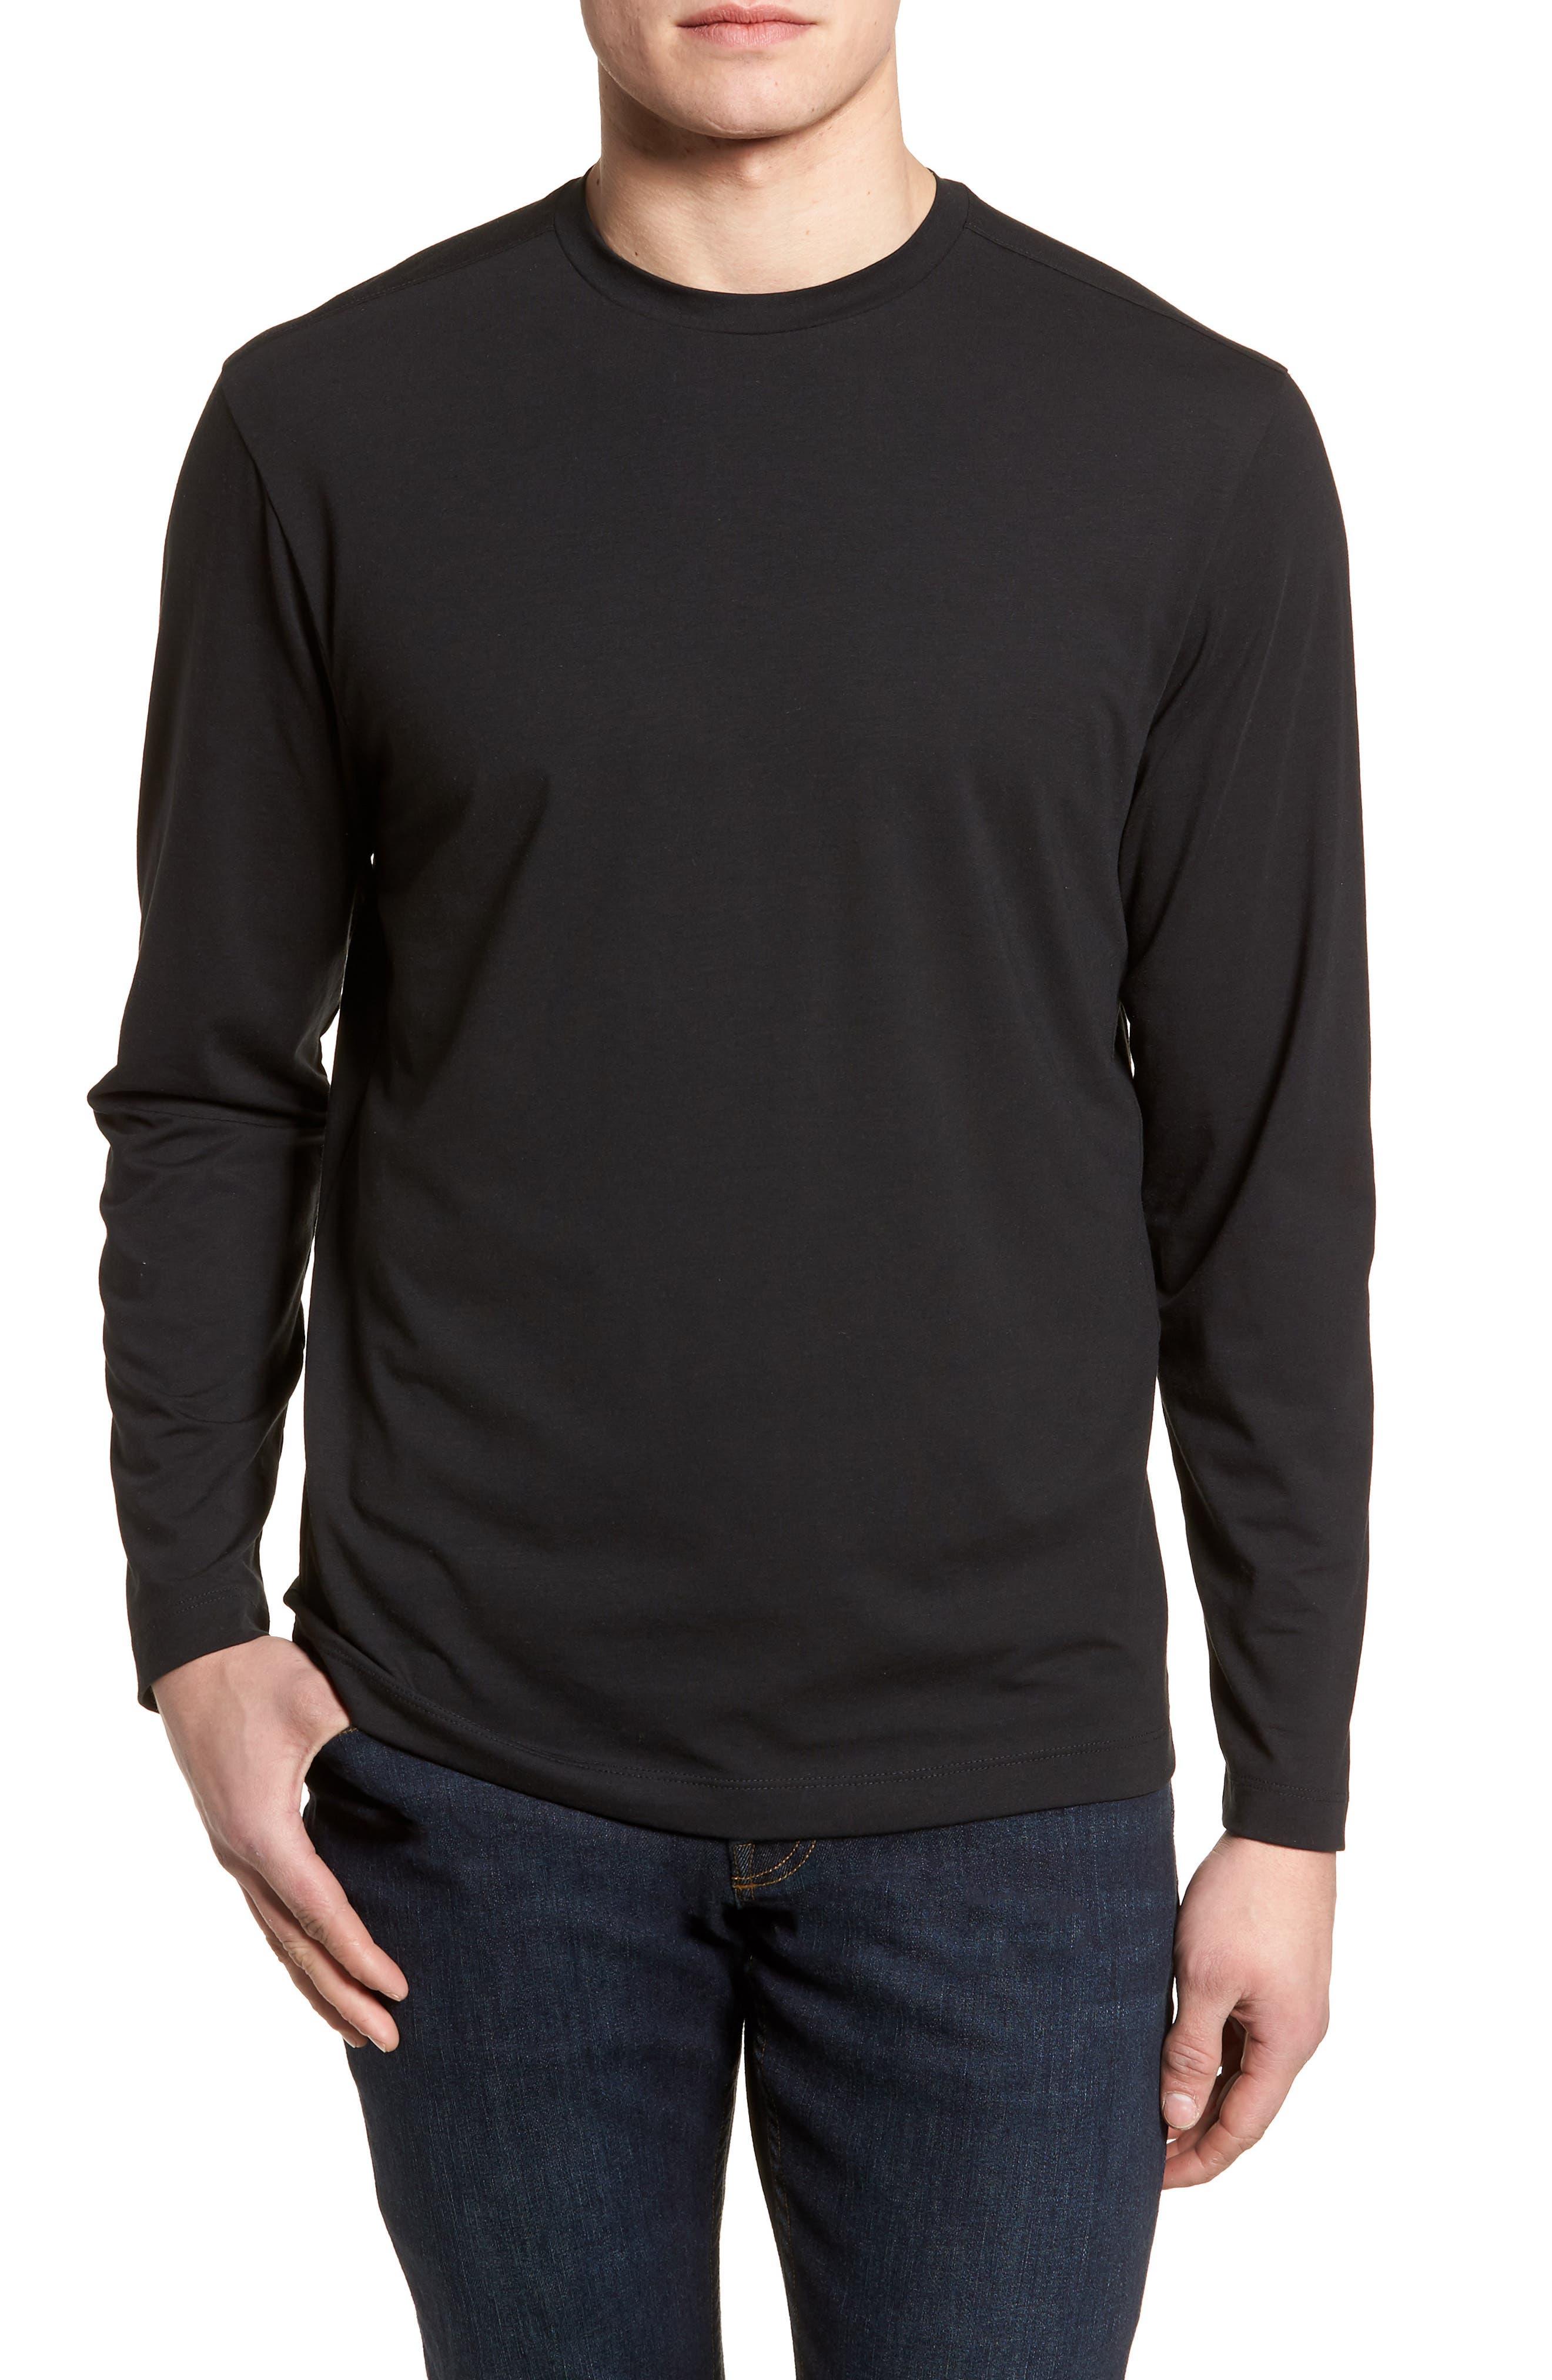 Tropicool T-Shirt,                         Main,                         color, 001